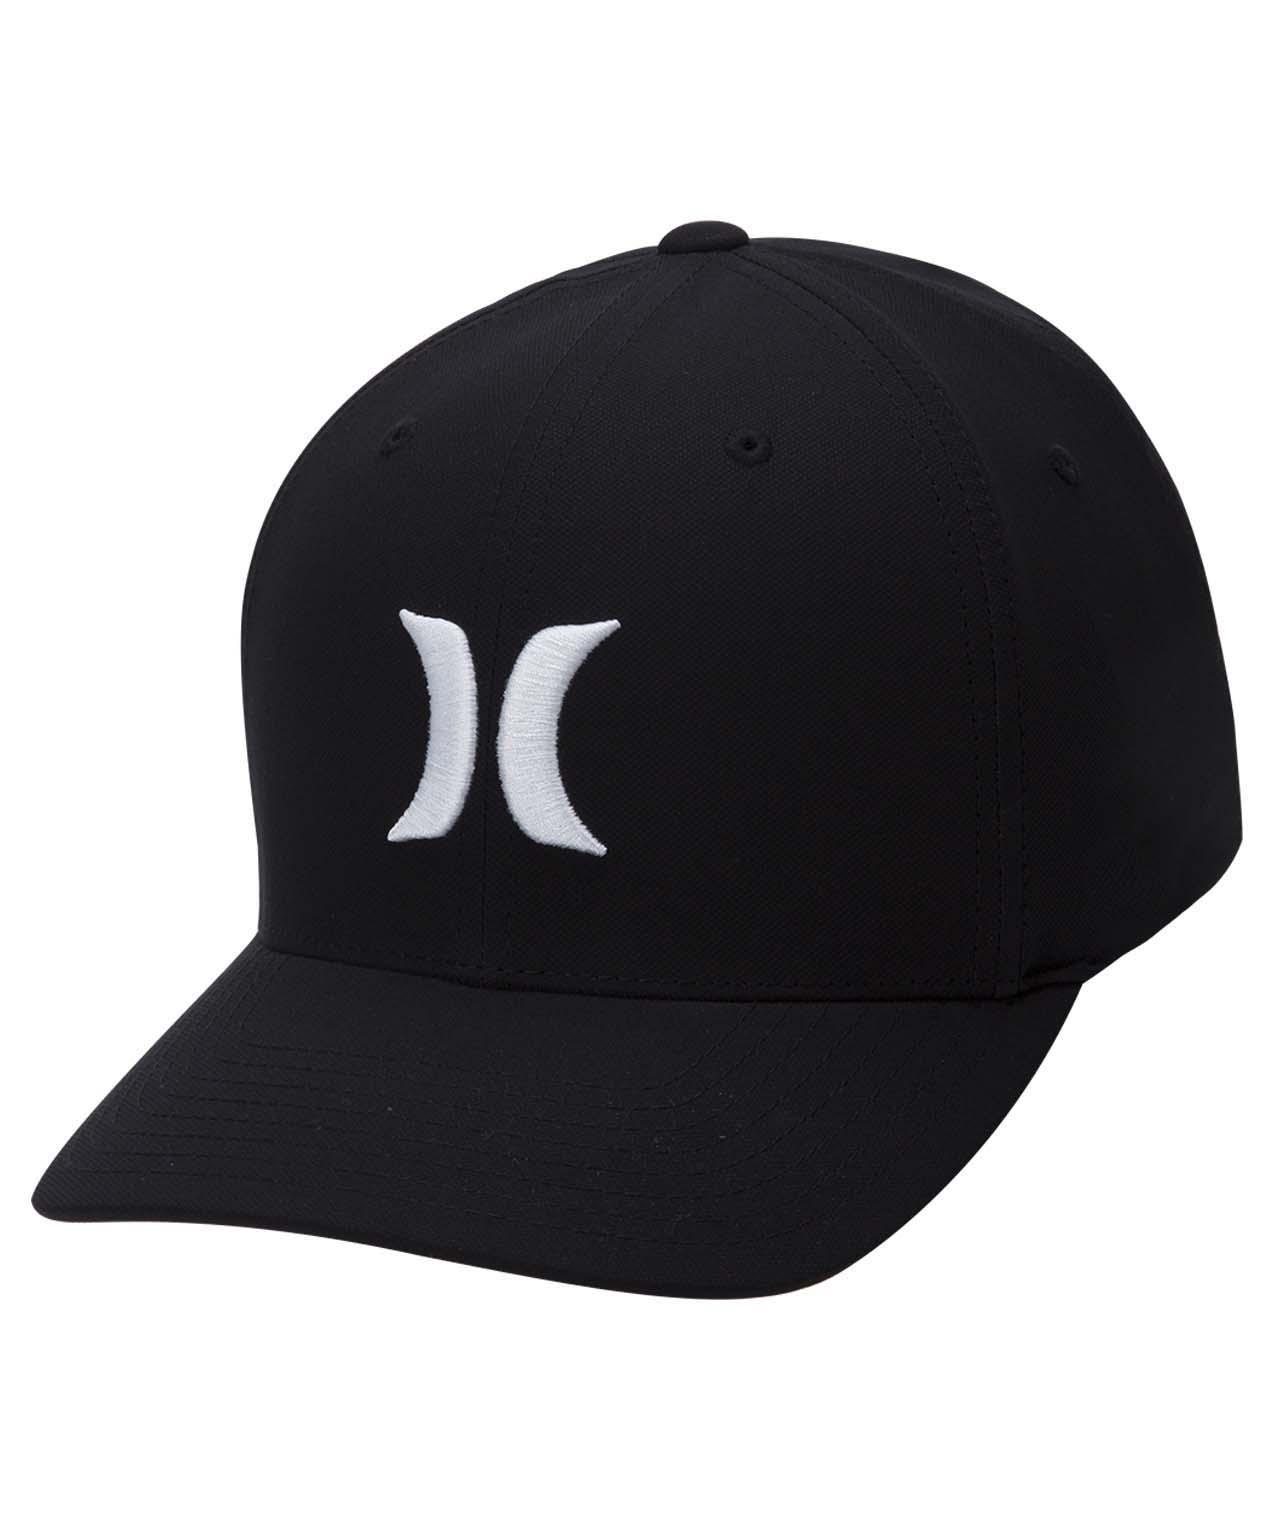 HURLEY DRI-FIT O&O 2.0 HAT B